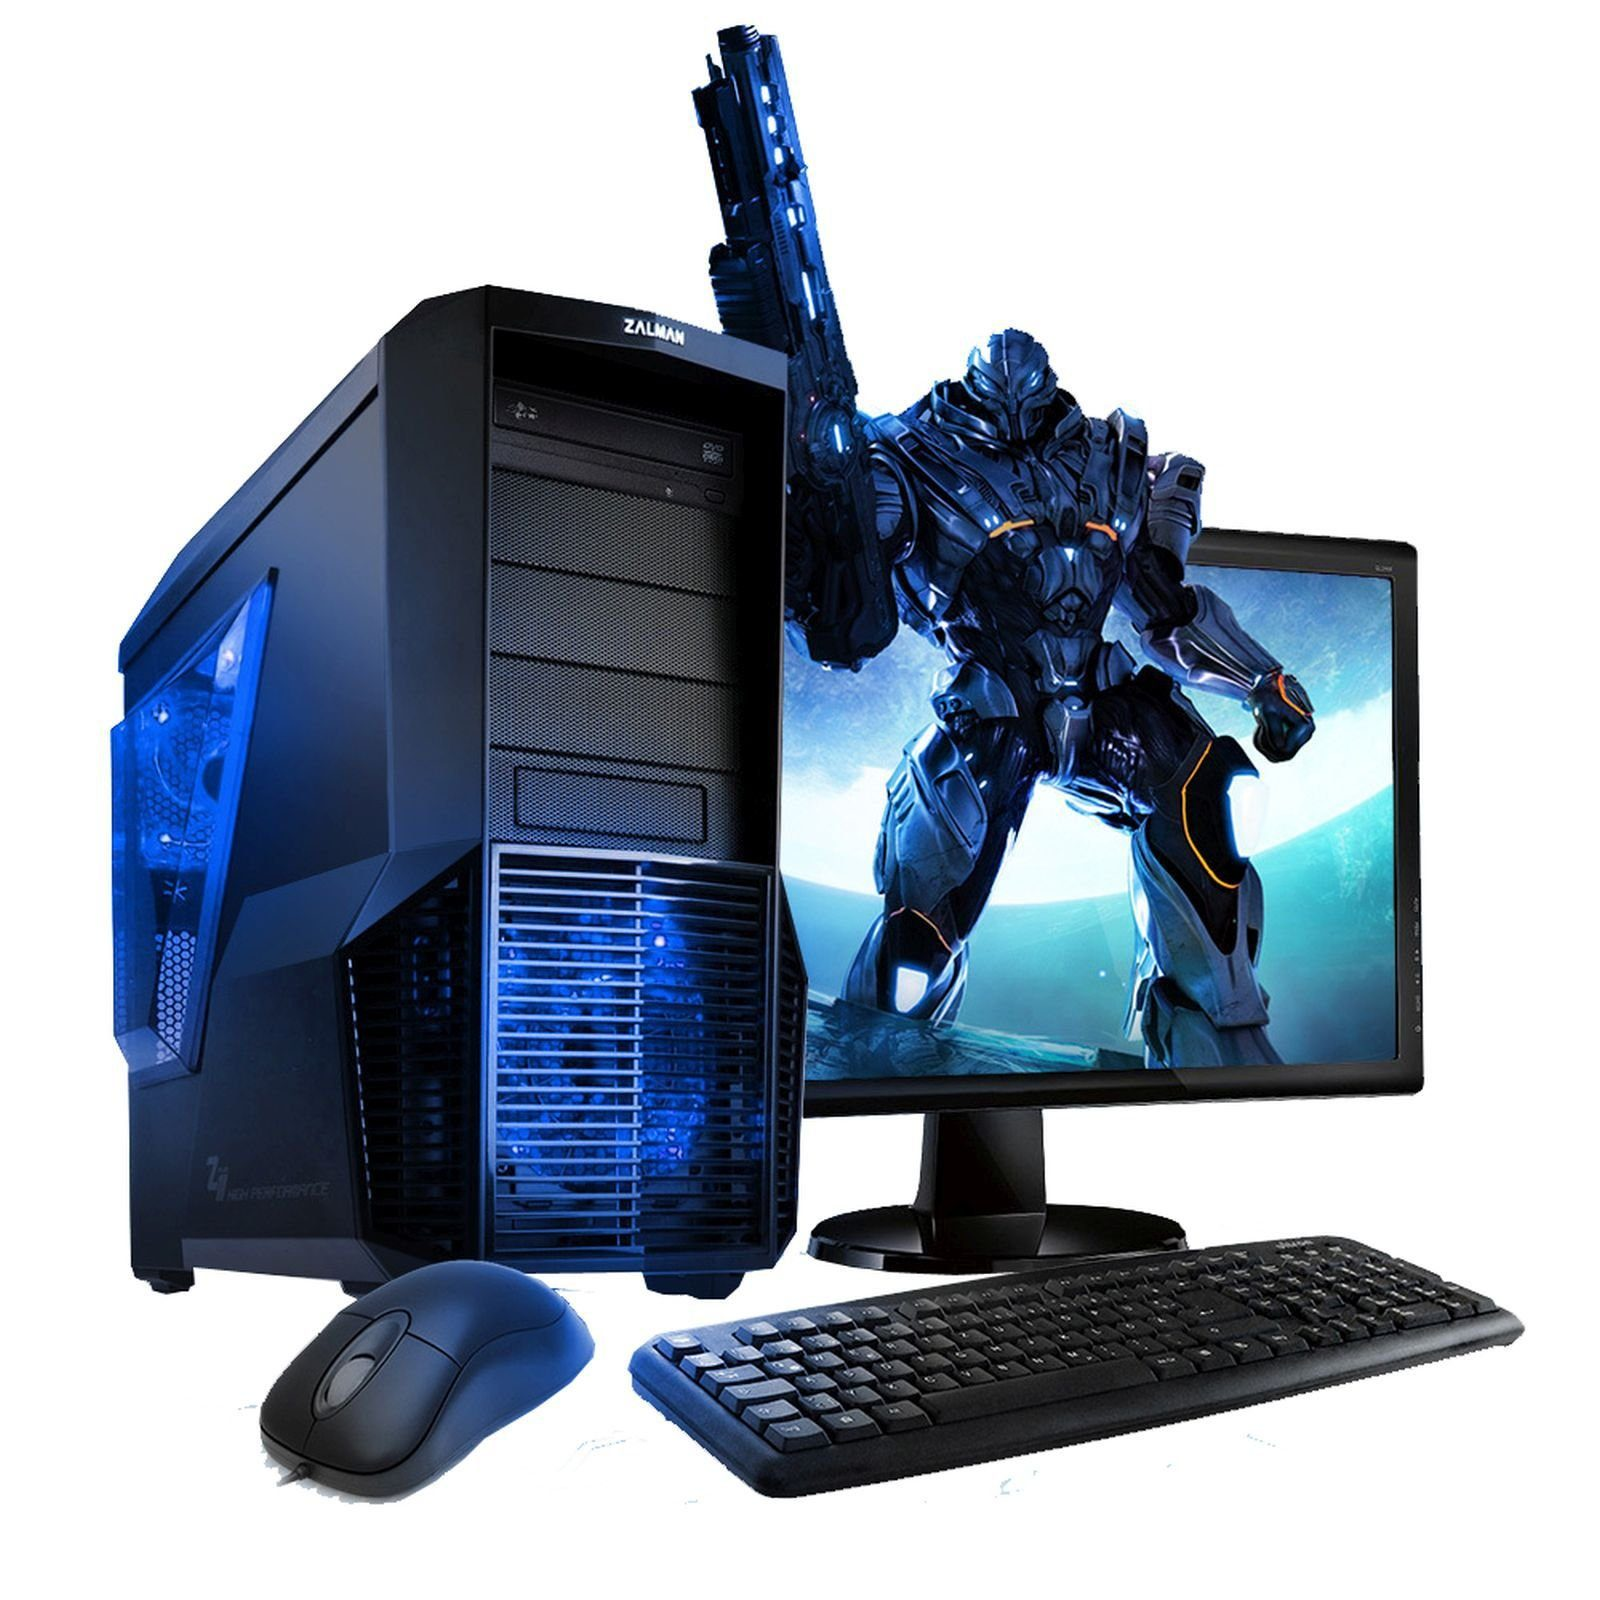 VCM Gaming PC Set / AMD FX-8300 / »GeForce GTX 1050, 2 GB/ 8 GB RAM / Windows 10 / 22«